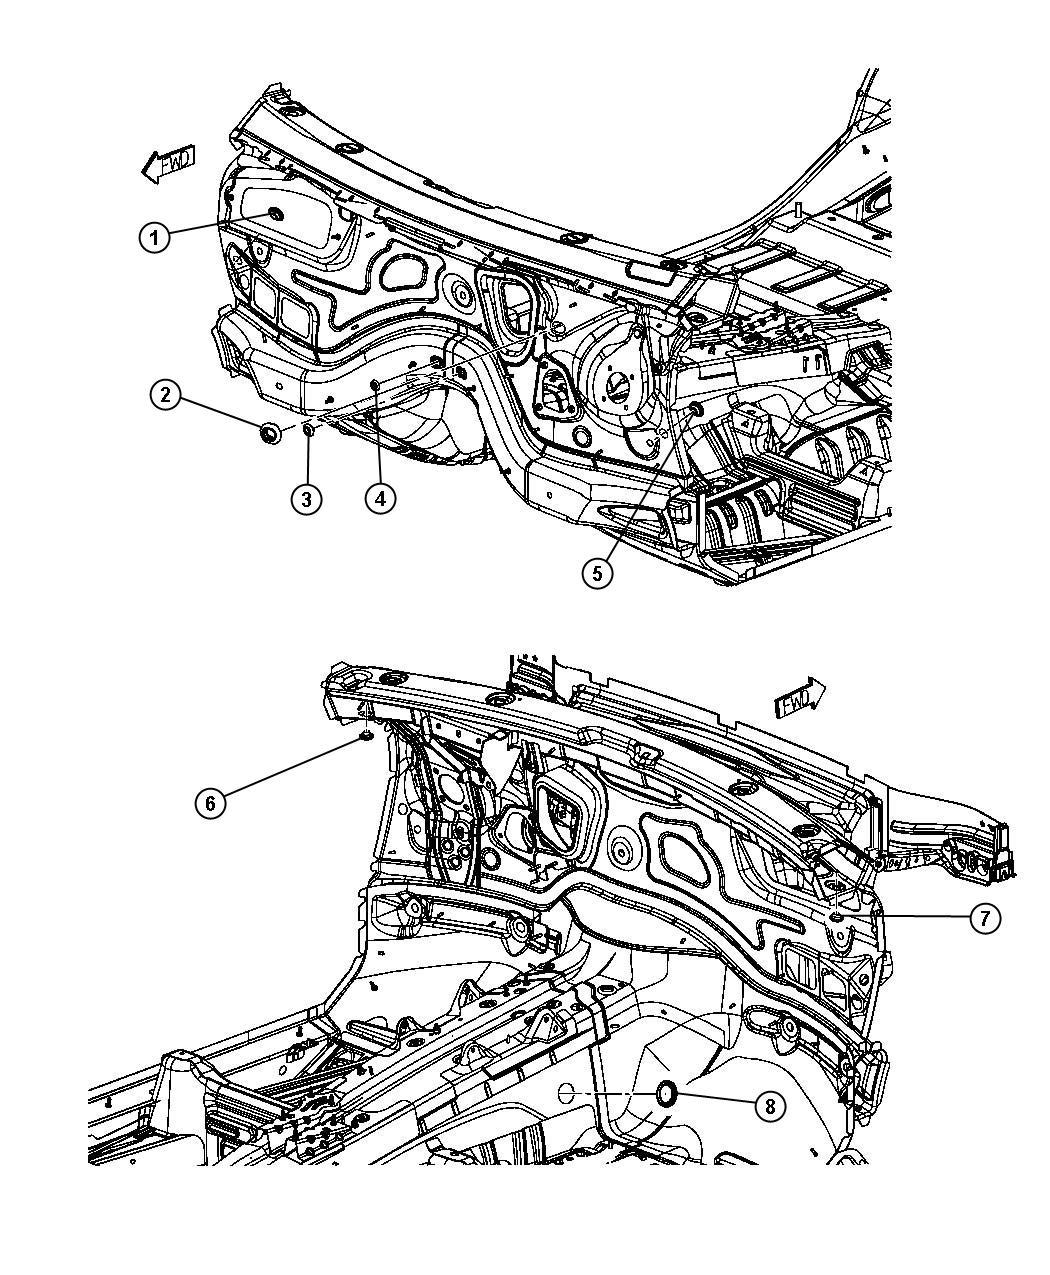 2013 Jeep Grand Cherokee Plug. Floor pan. Front floor pan